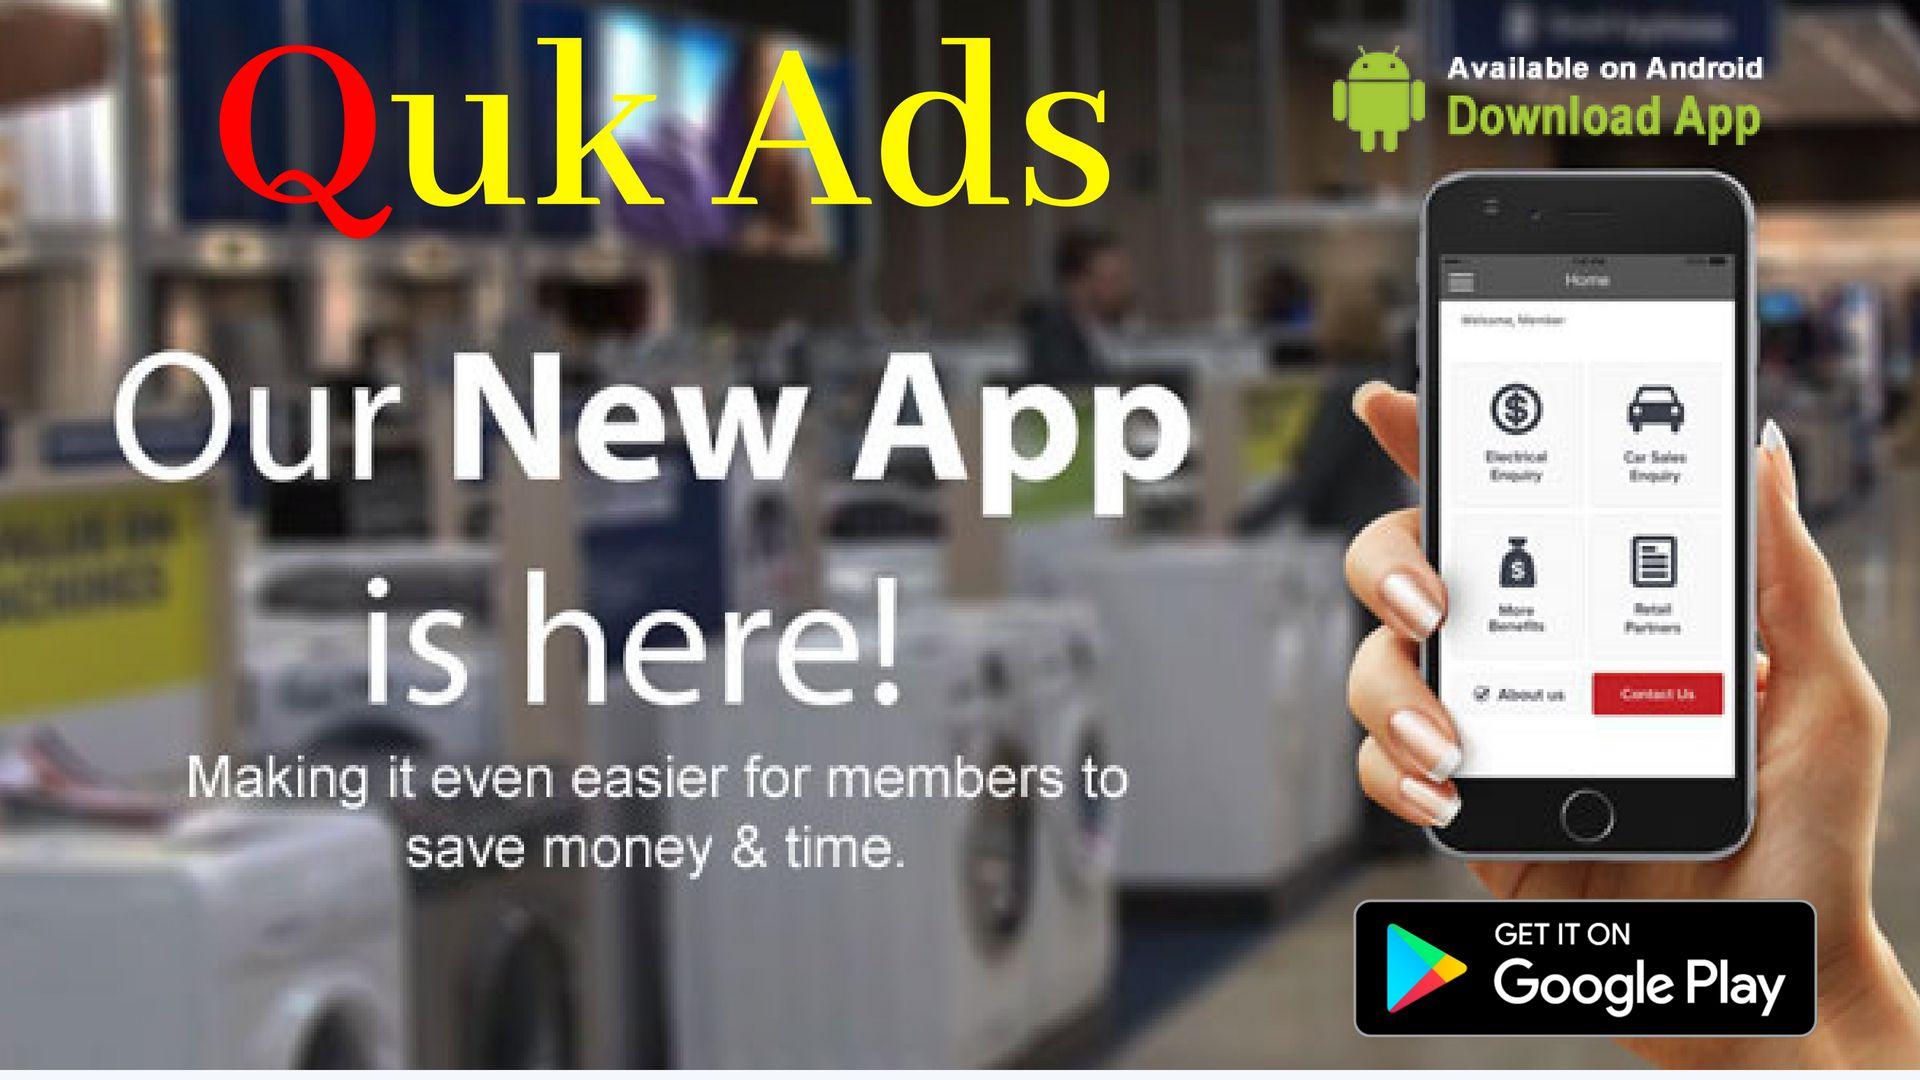 Quk Ads NEW APP